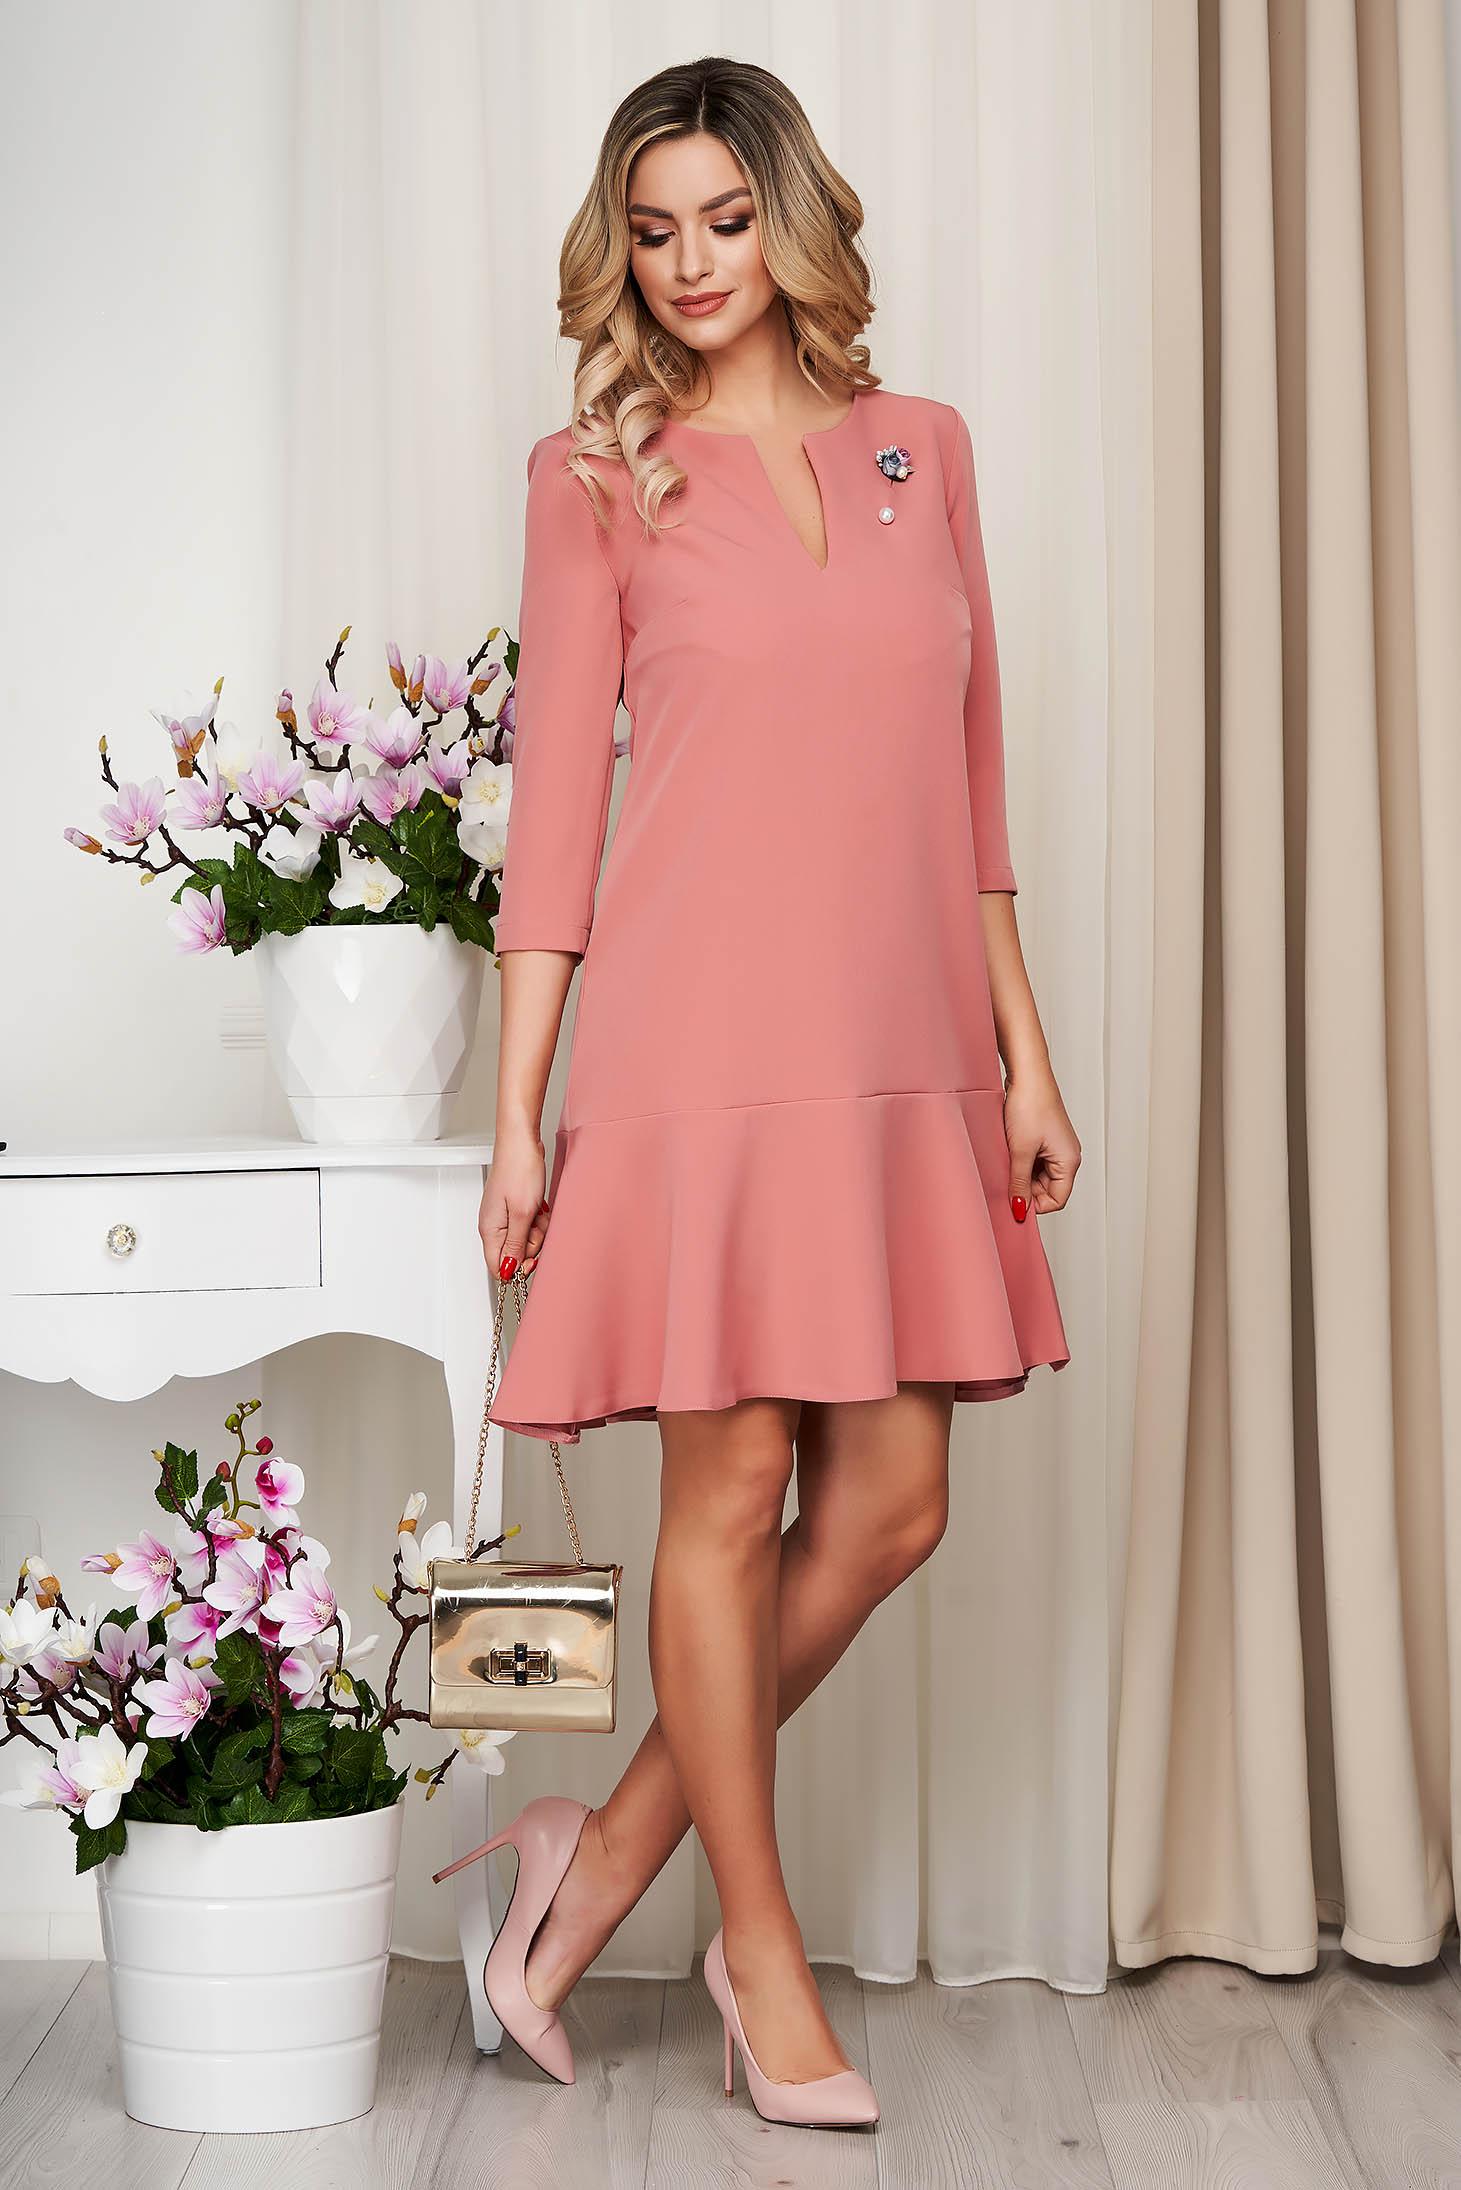 Rochie StarShinerS roz prafuit din stofa elastica fara captuseala cu decolteu in v accesorizata cu brosa